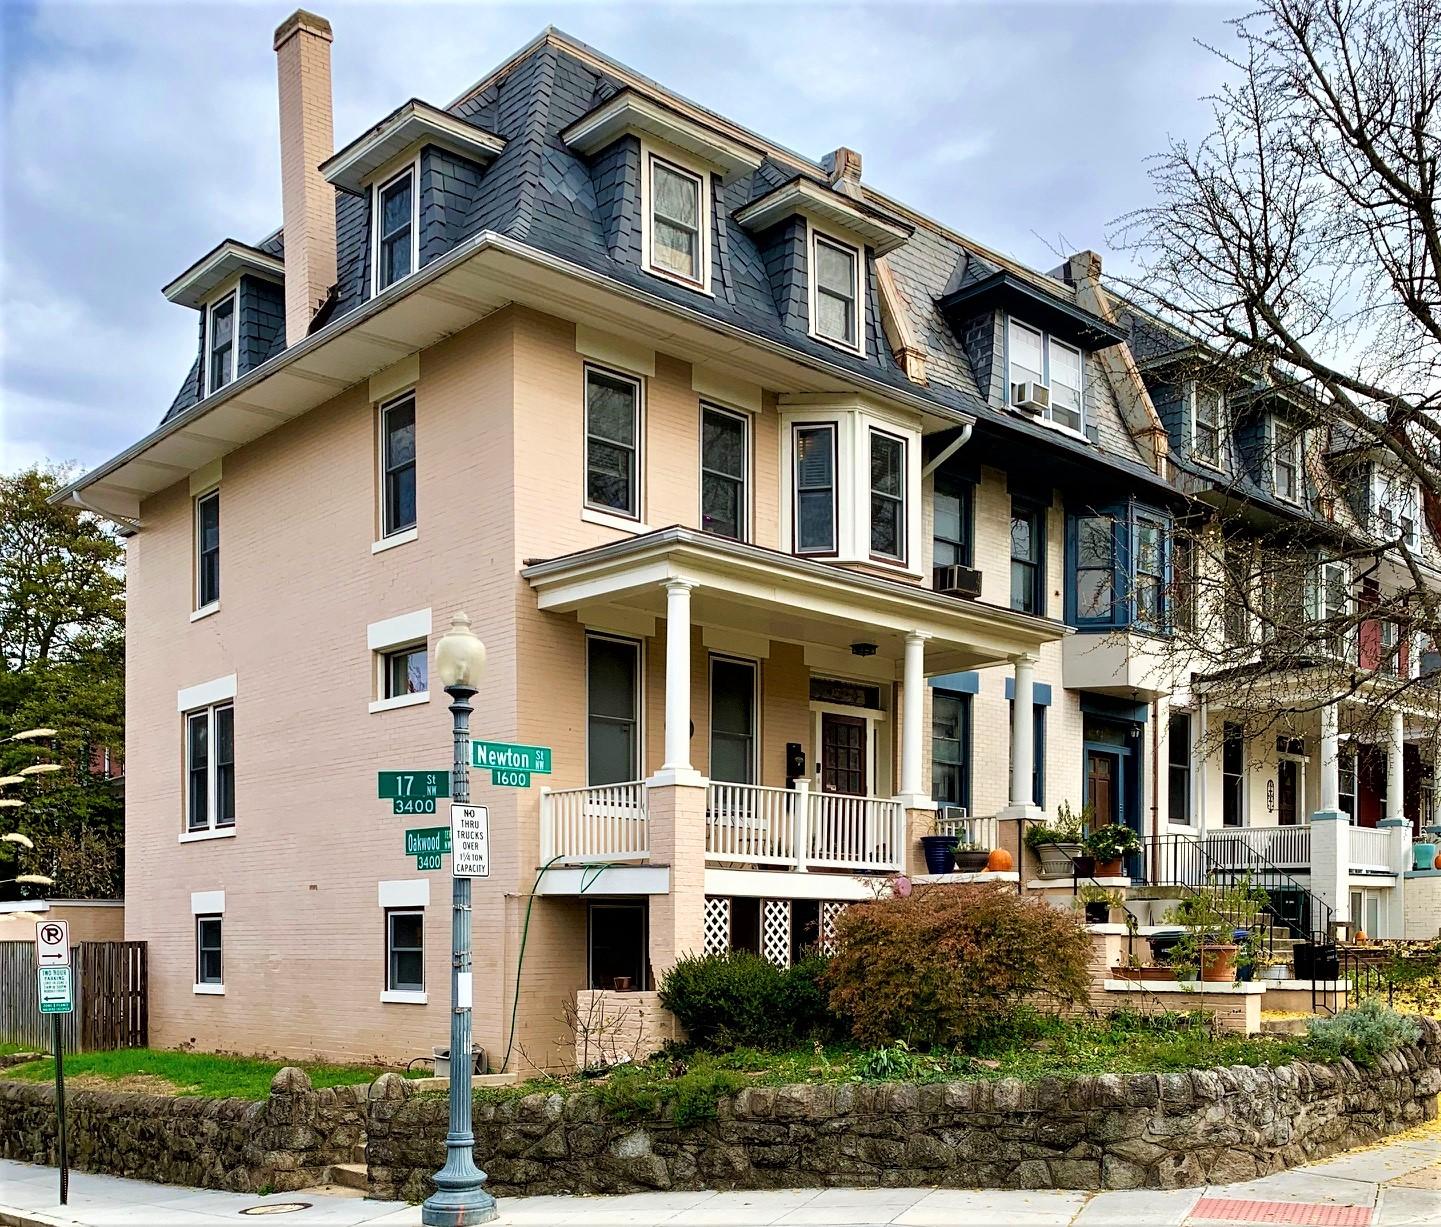 Washington, DC Townhomes For Sale. Newton Street in Mount Pleasant. Artyom Shmatko Luxury Real Estate Agent